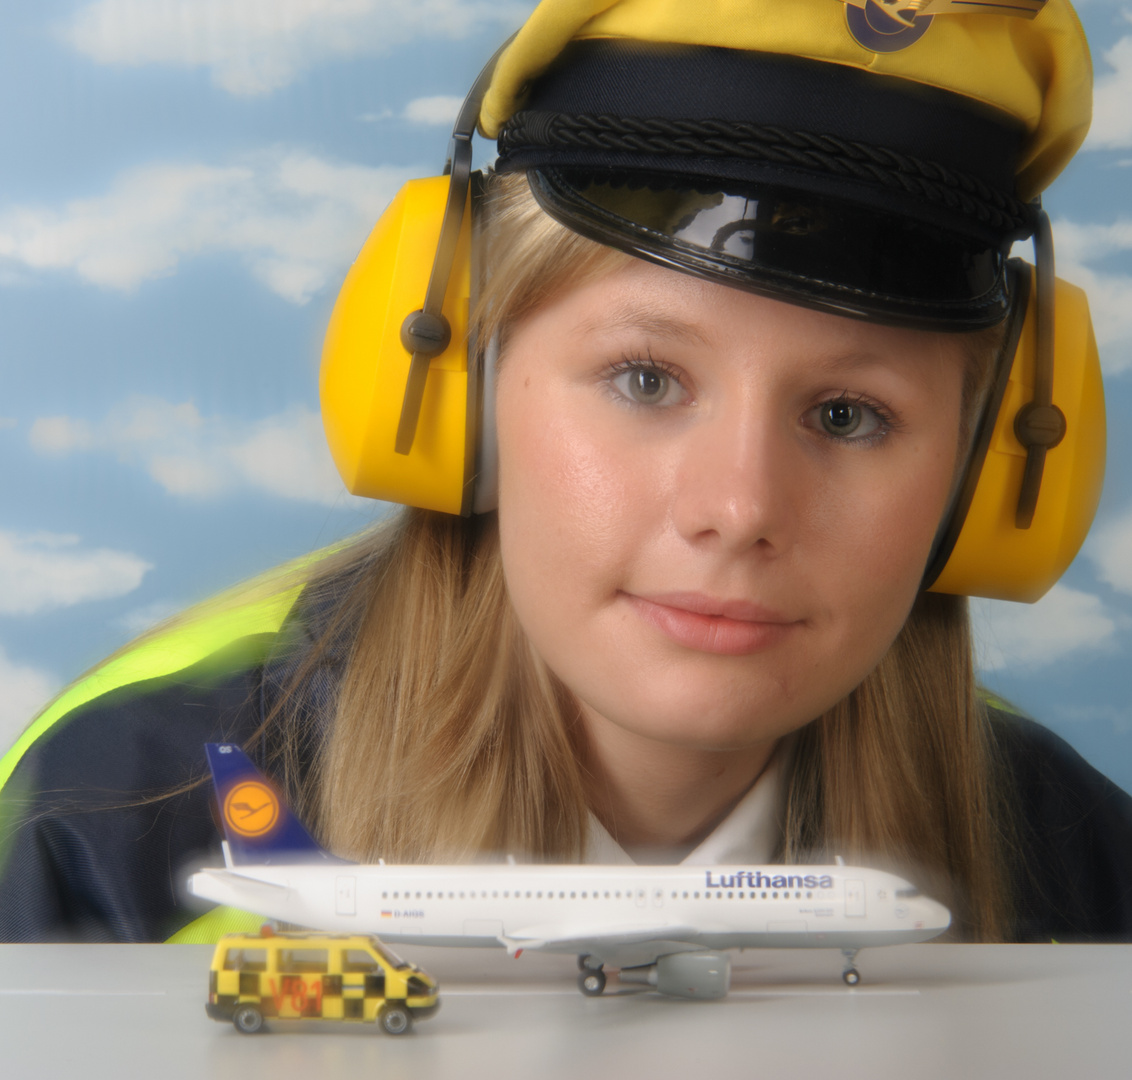 Flightcontrollergirl 2